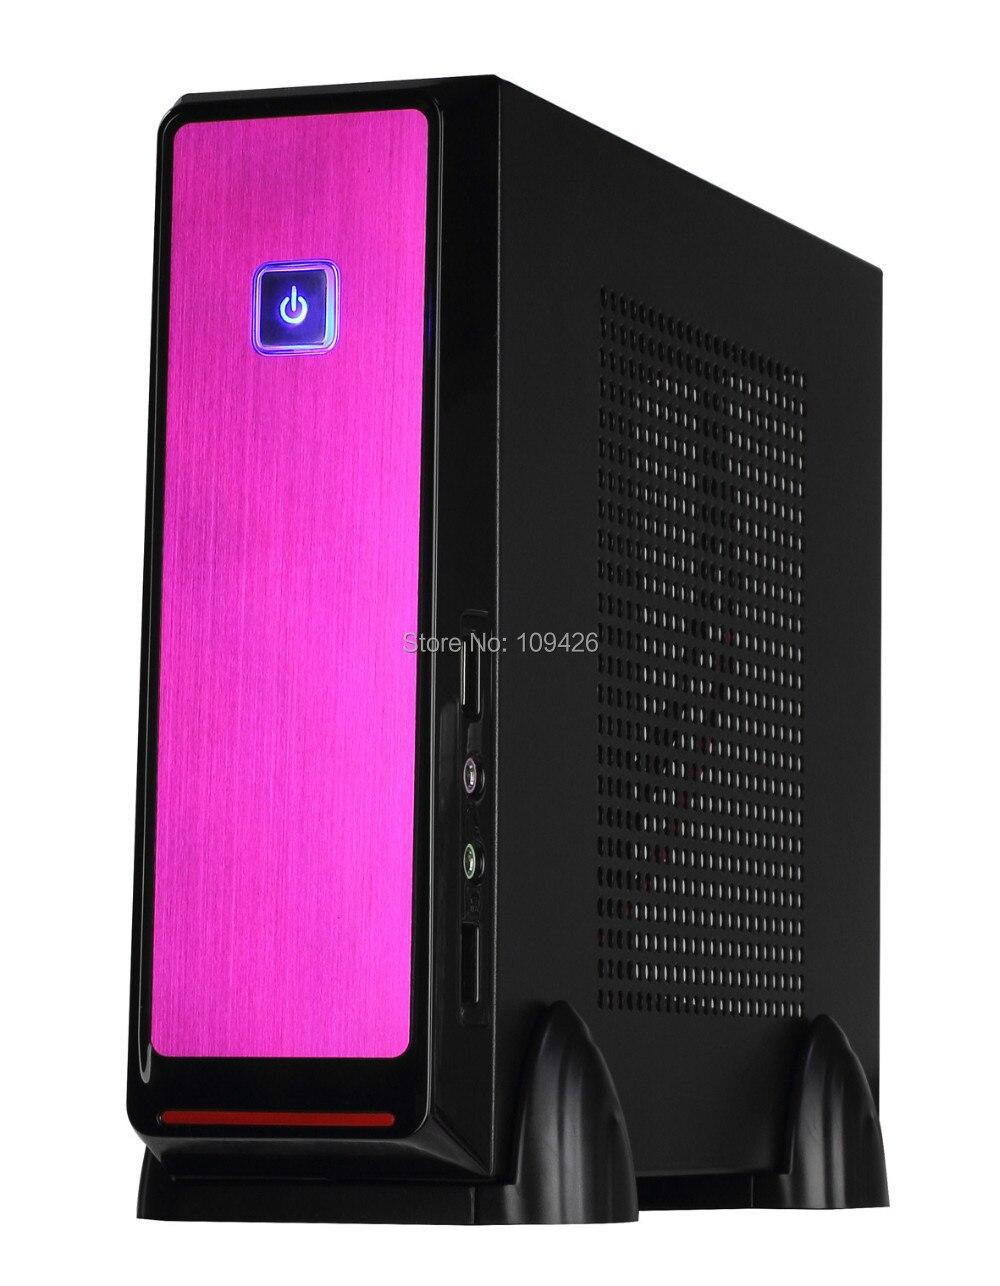 REALAN High Quality Mini ITX Desktop Computer E-2019 with Power Supply (SGCC 0.8mm, 2.5HDD, black silver pink)